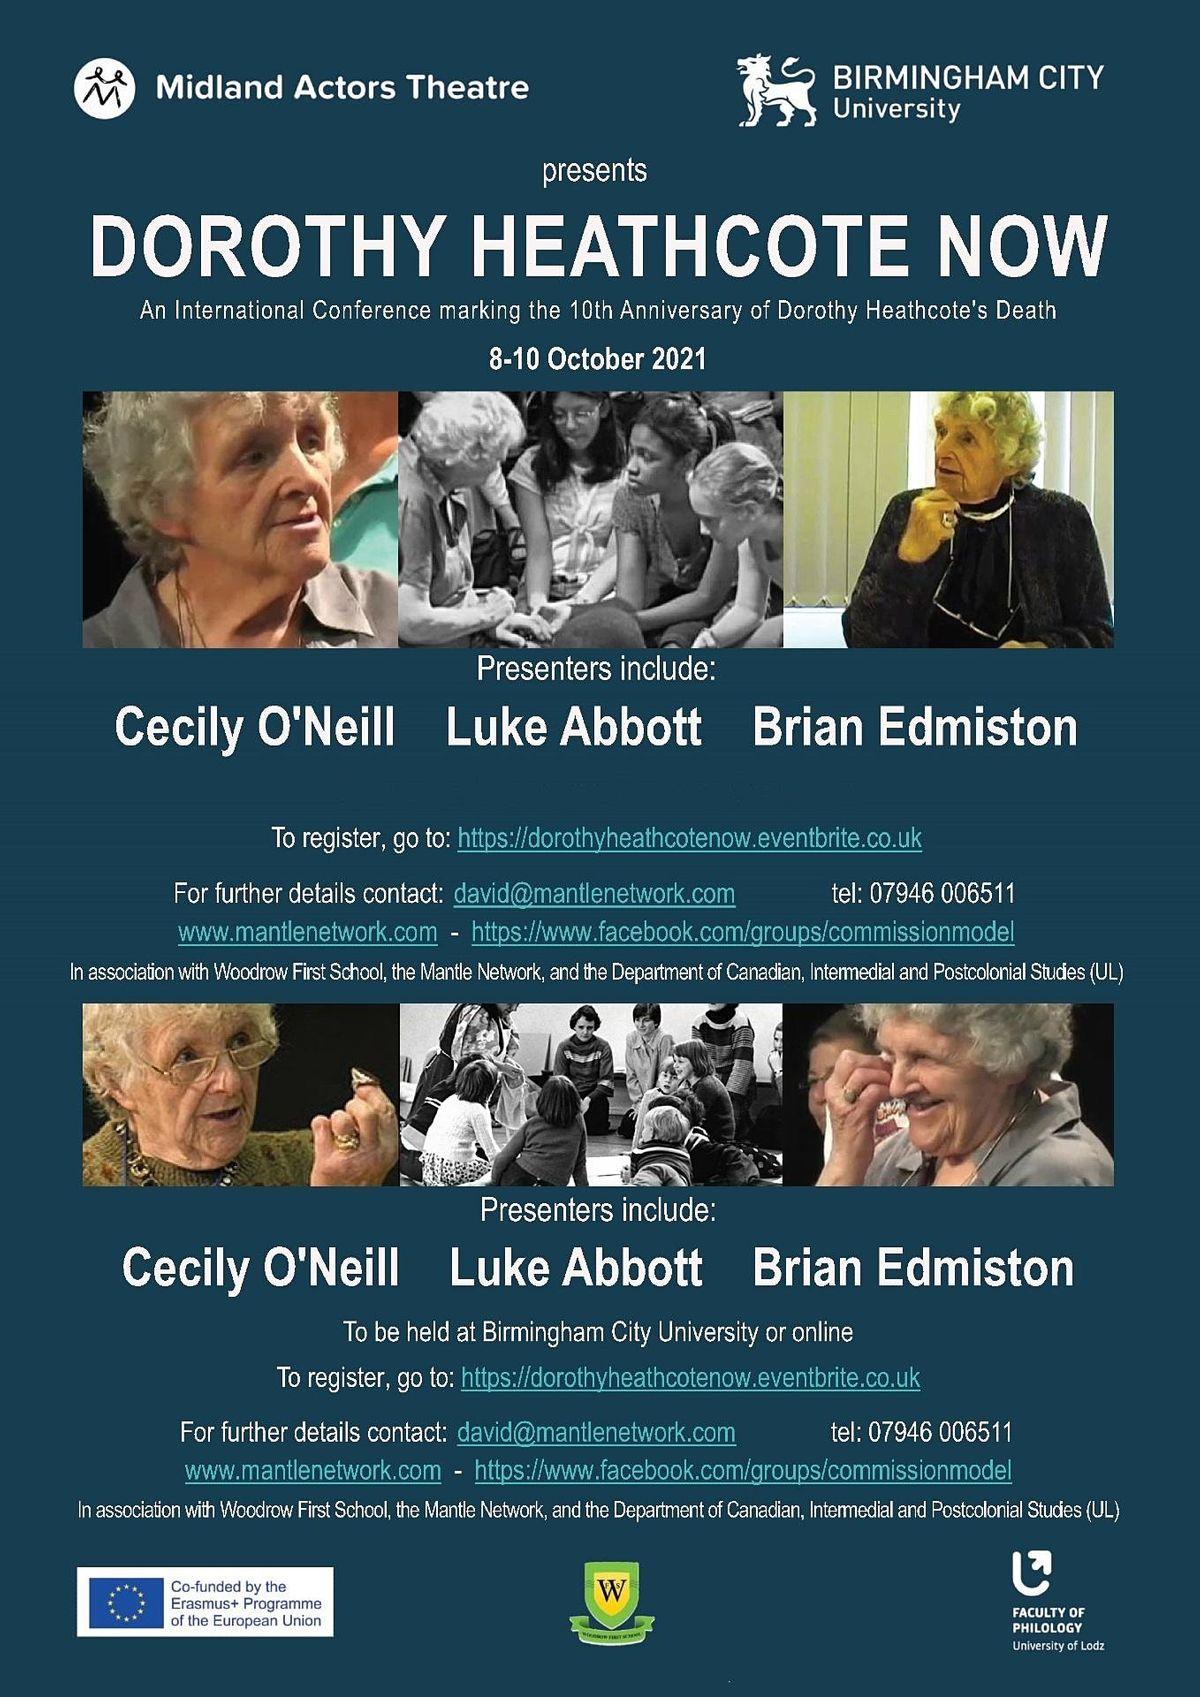 Dorothy Heathcote Now: International Conference